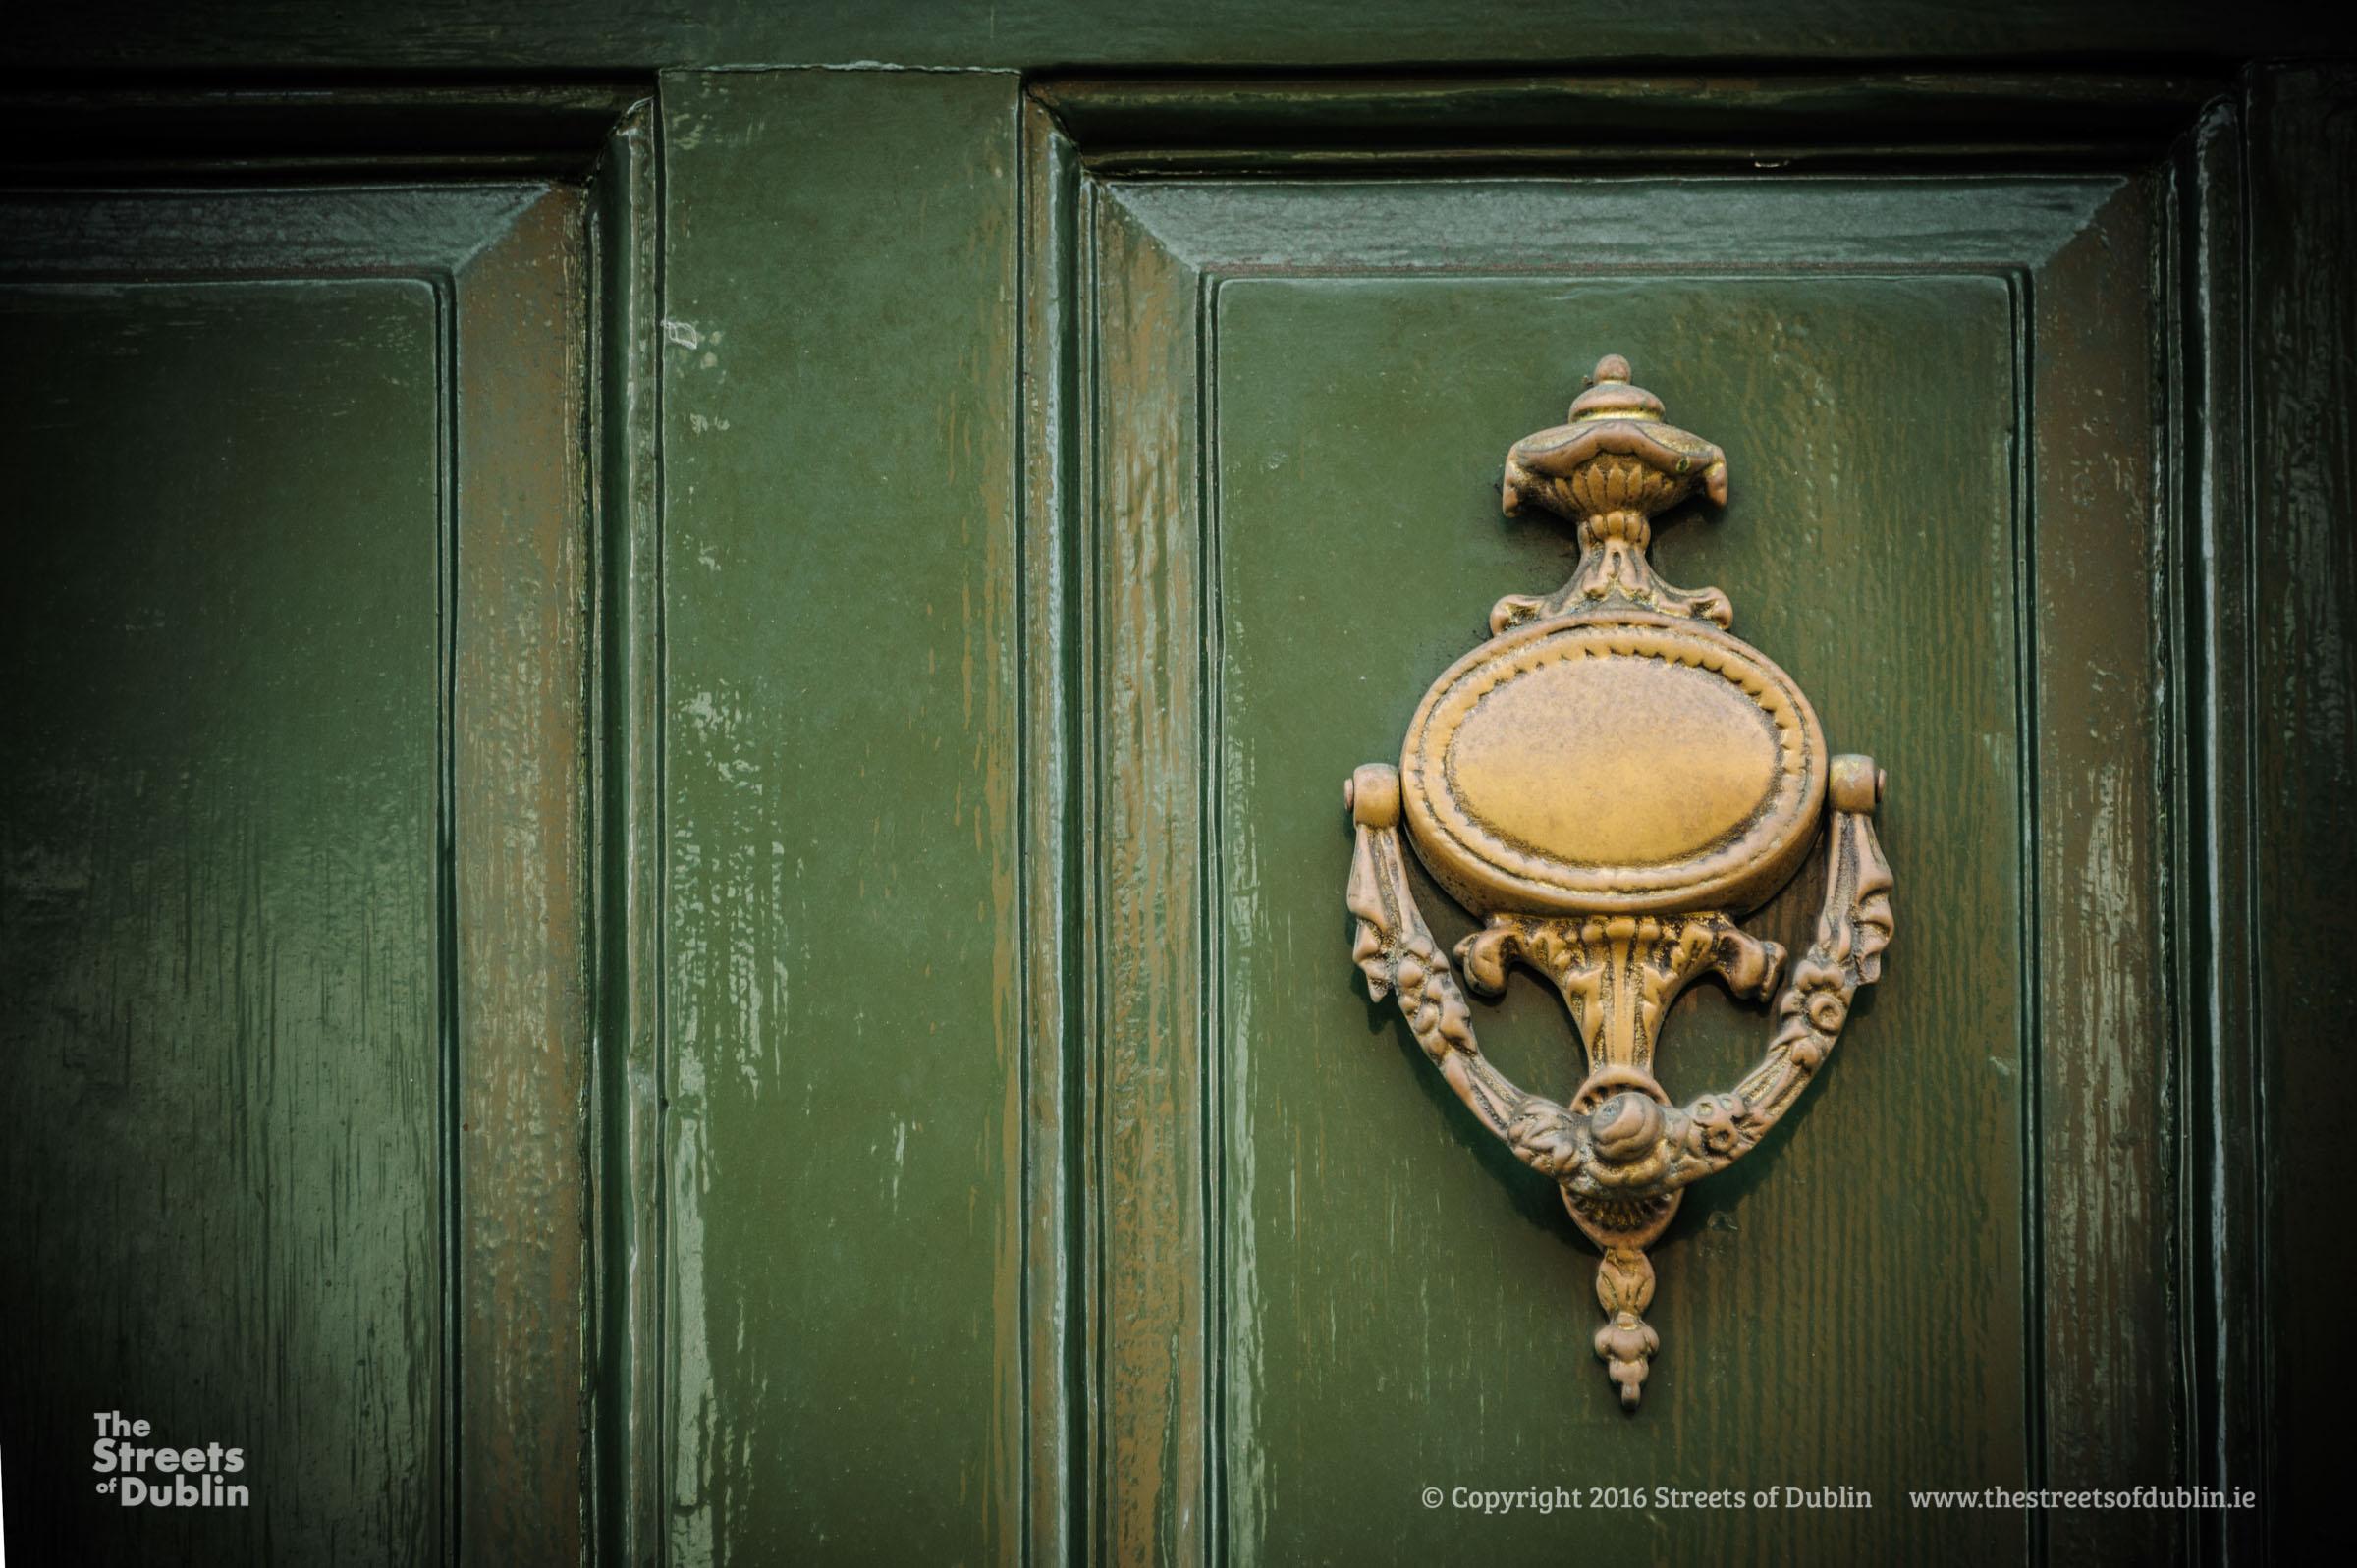 Streets-of-Dublin-Photo-8059.jpg